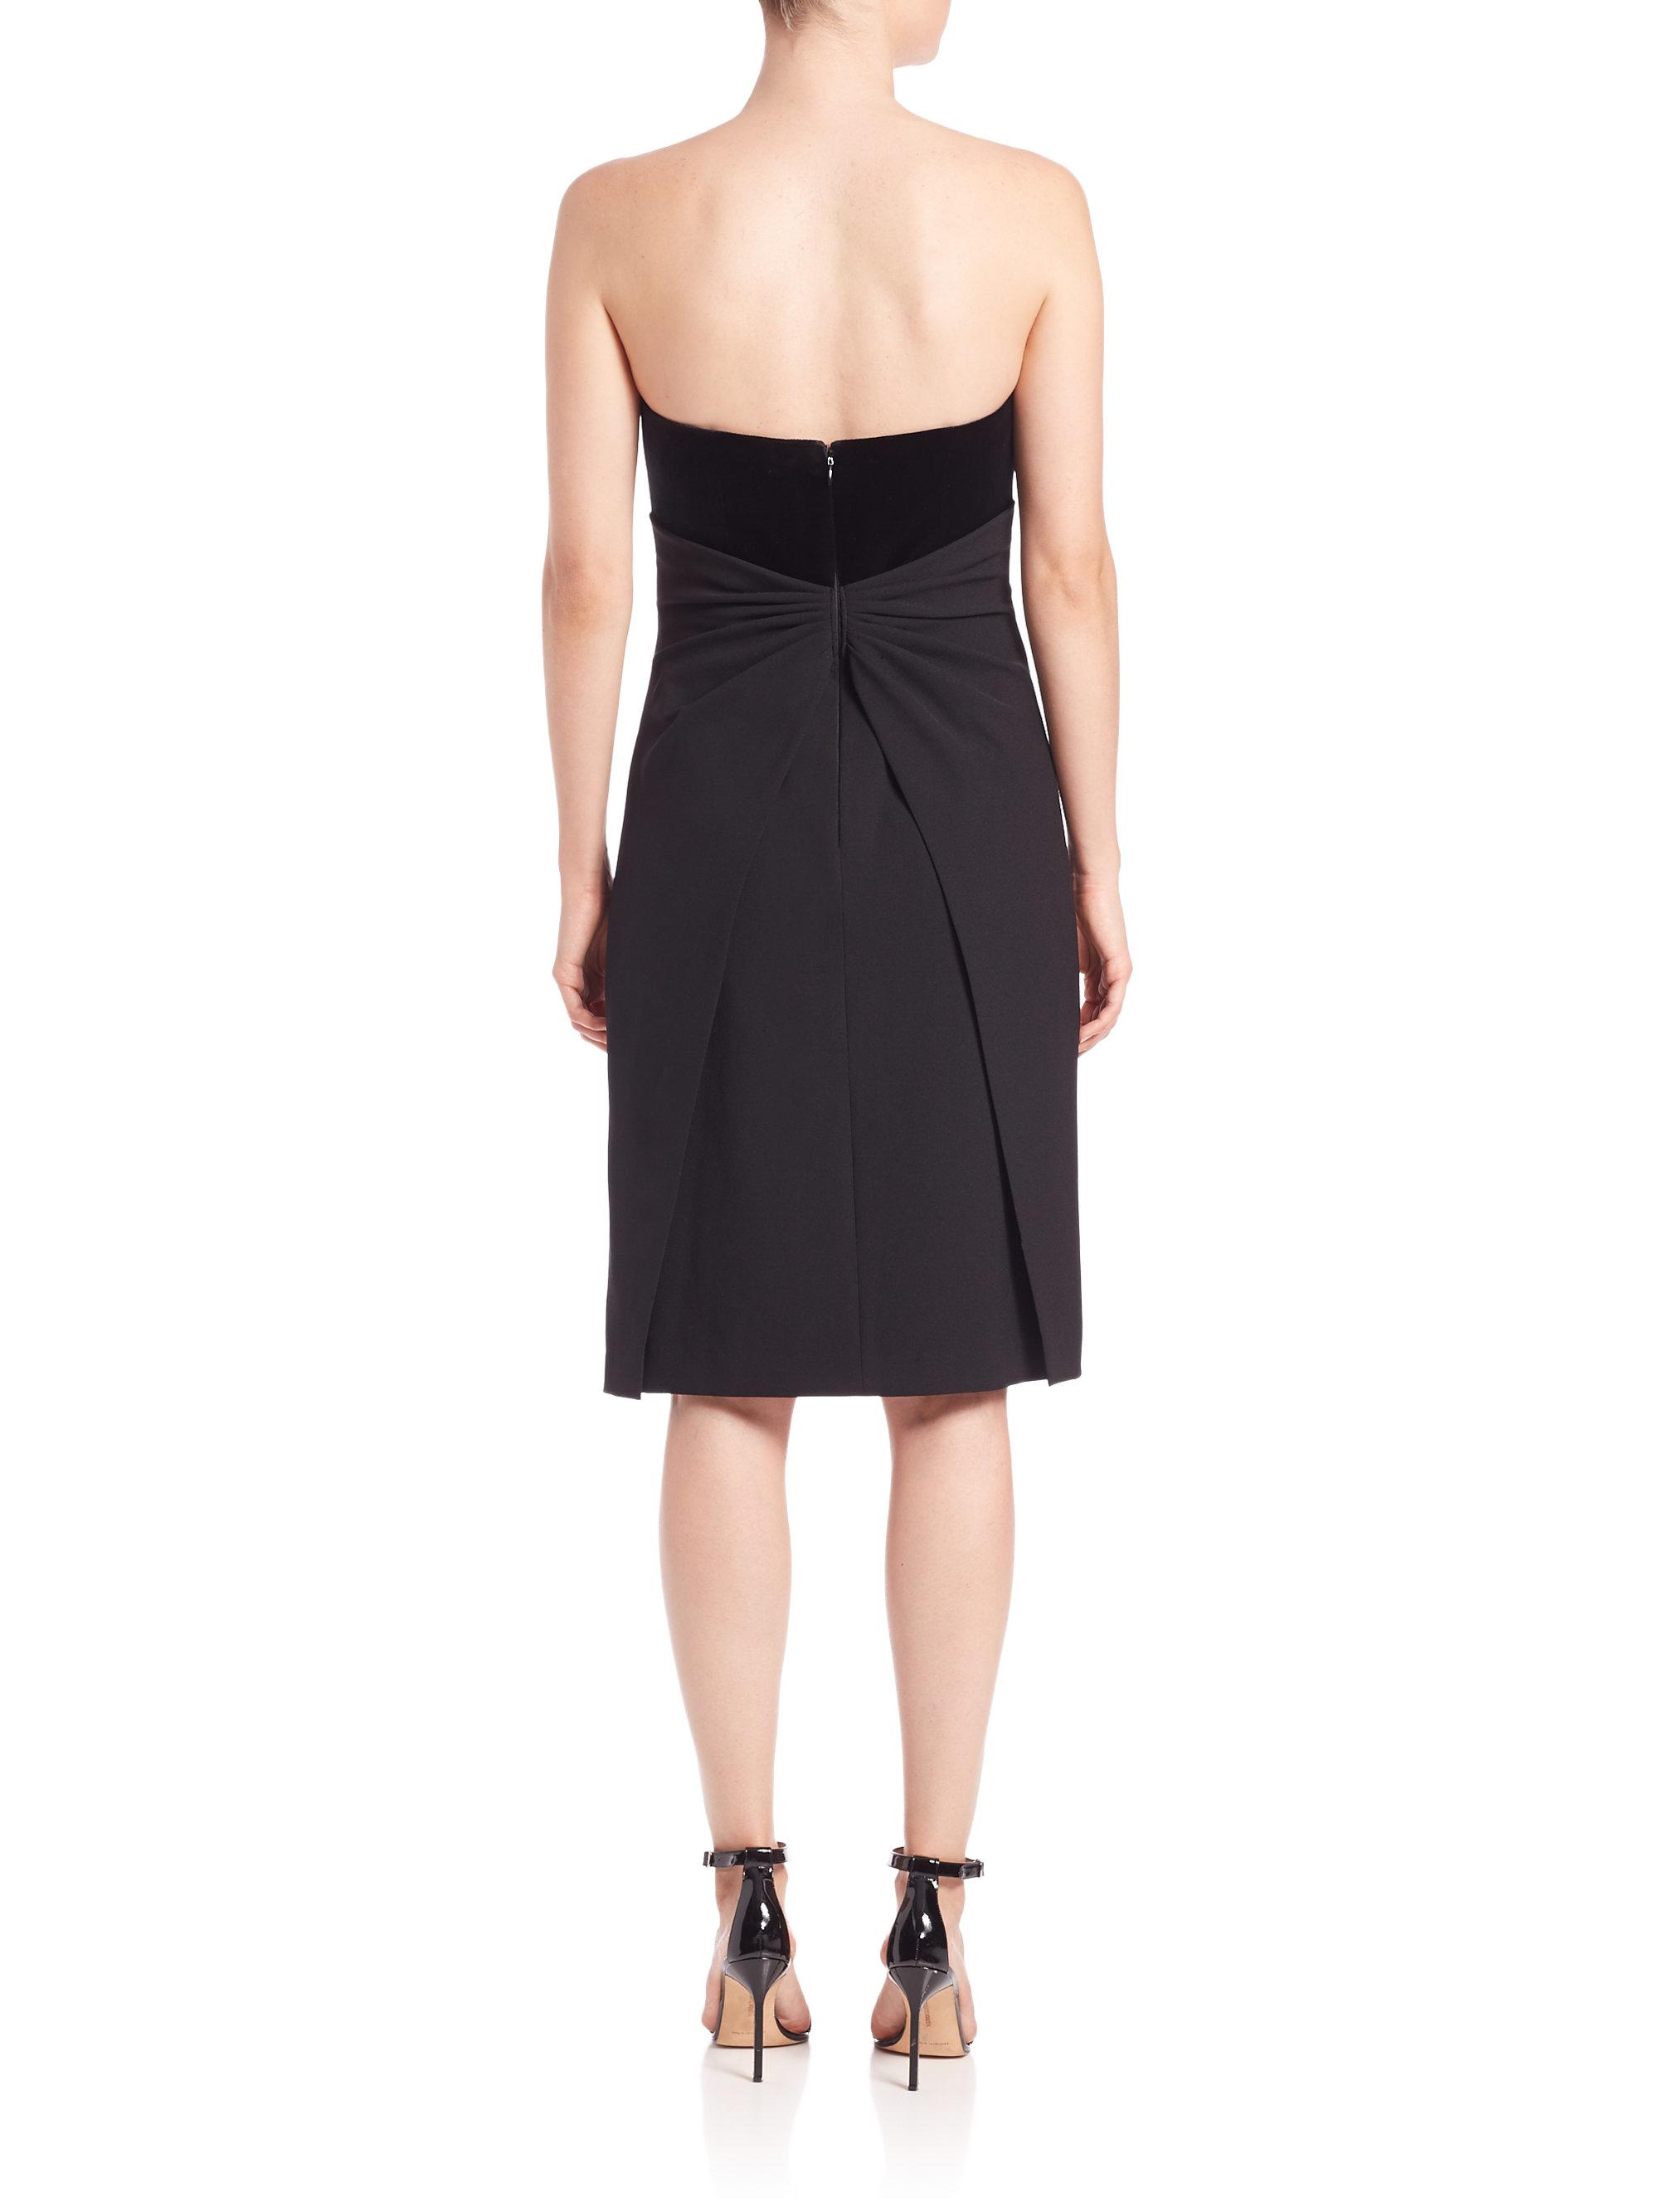 Black Strapless Bow Dress